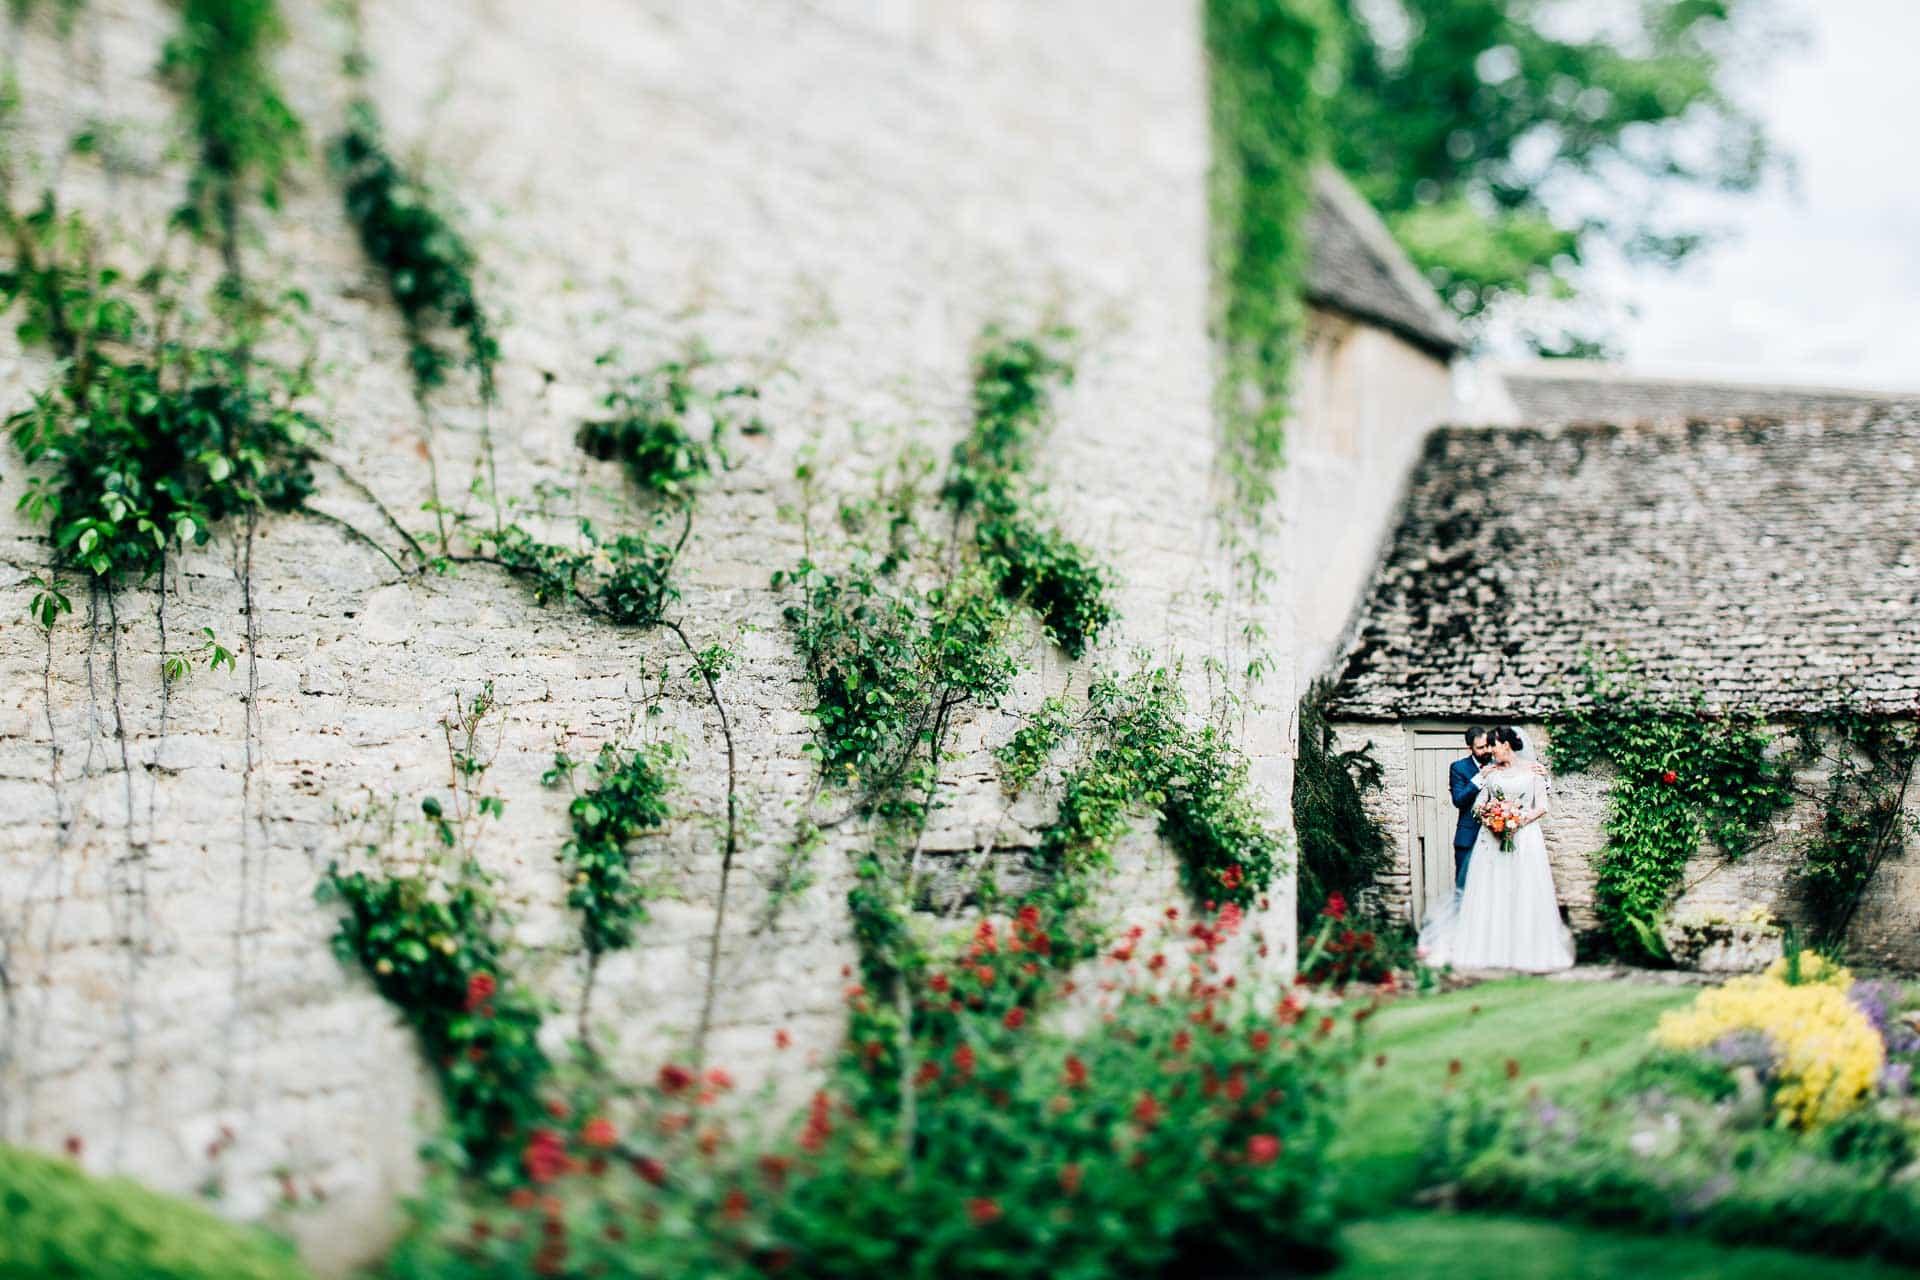 Caswell House Wedding Photography - couple by farm house